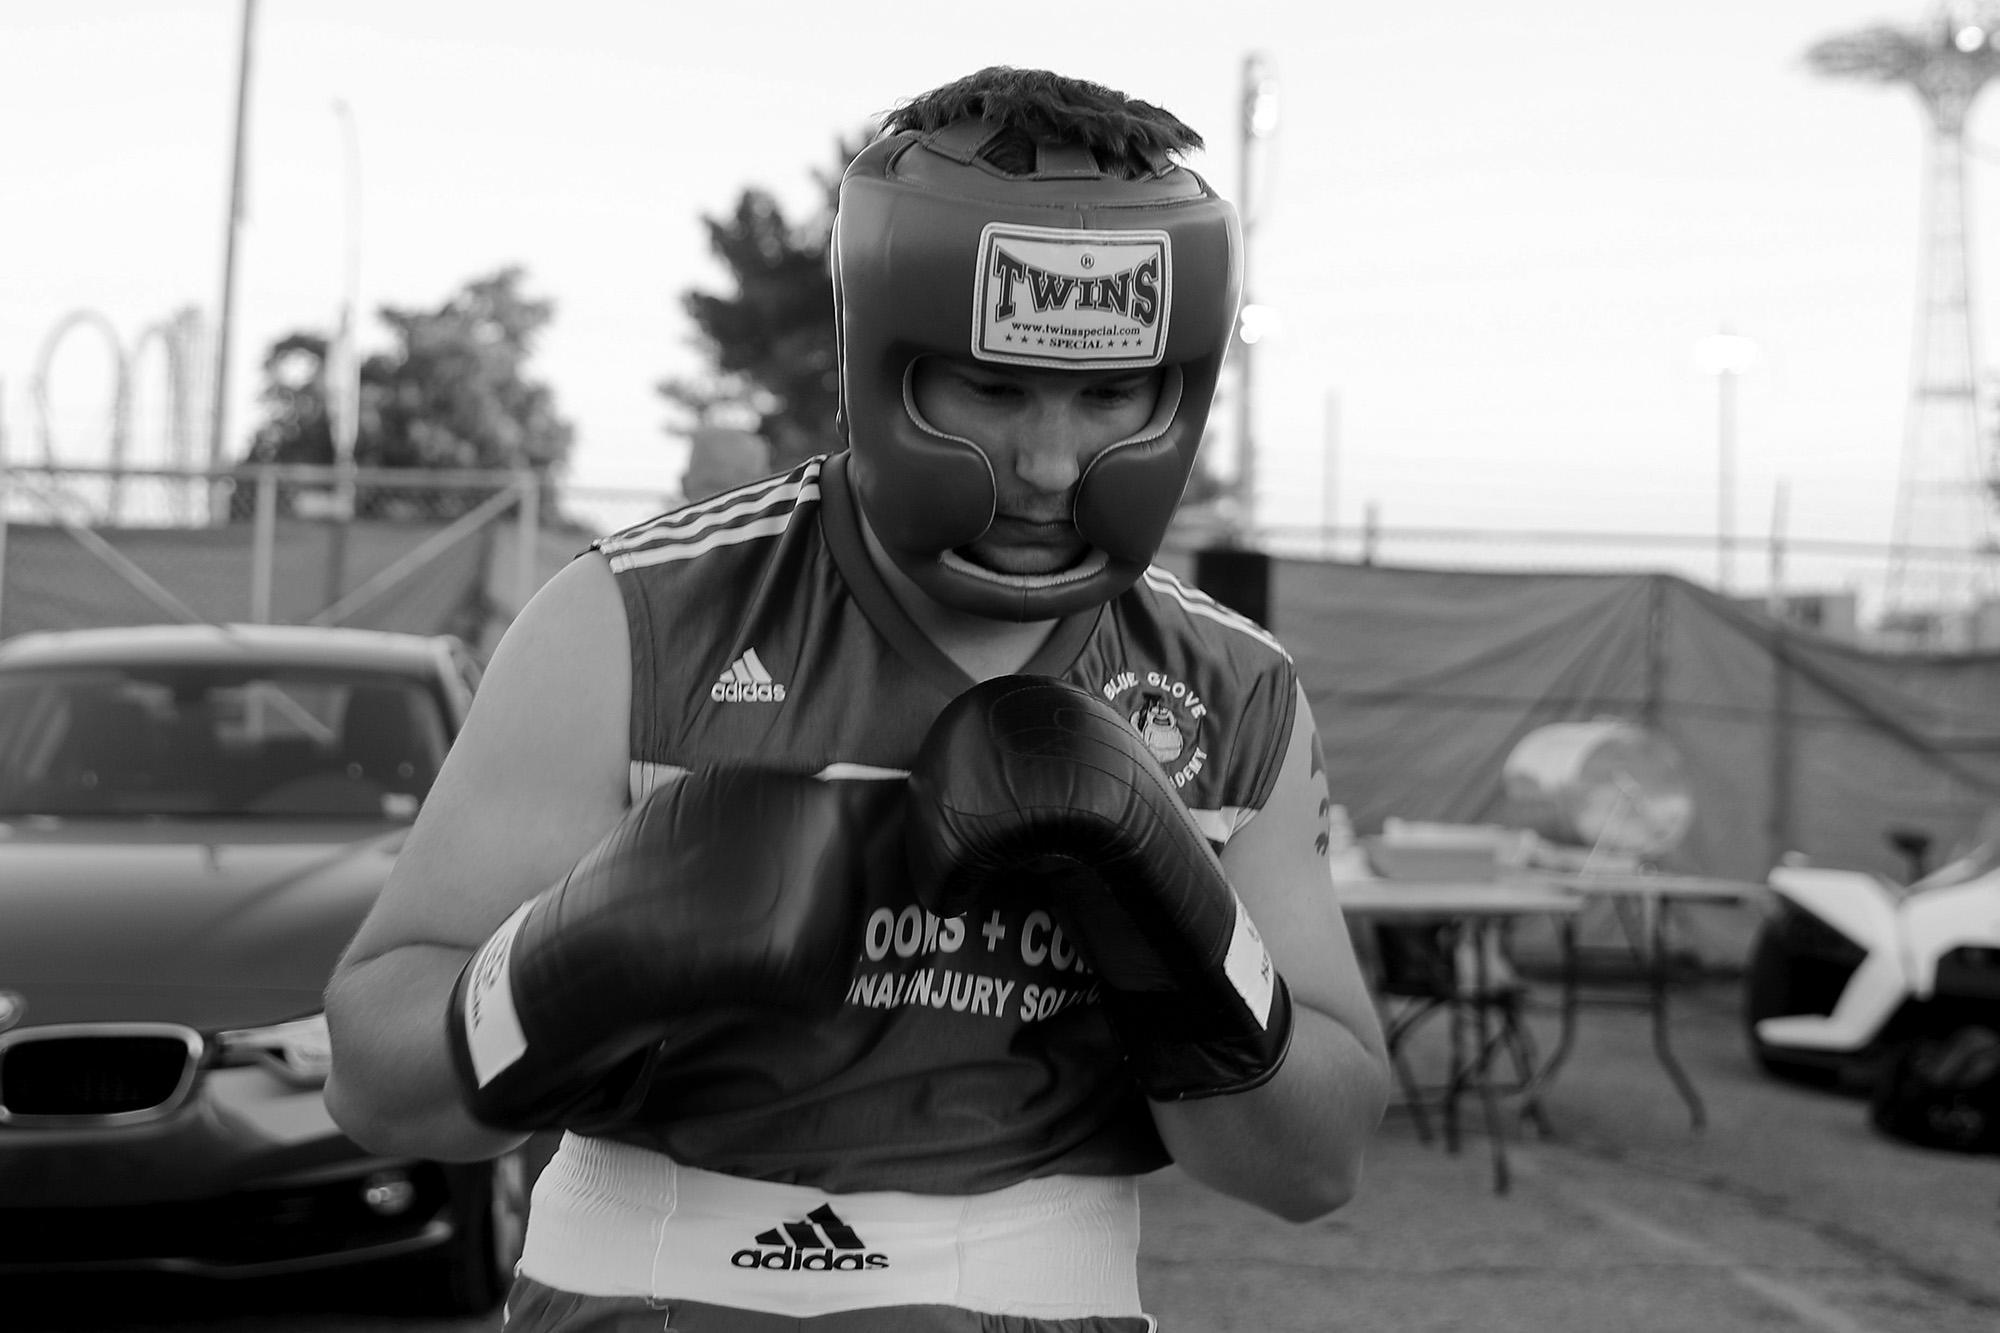 <p>Blue Glove Boxing Academy's Joe Mason warms up before his fight at the 'Brooklyn Smoker' in the parking lot of Gargiulo's Italian Restaurant in Coney Island, Brooklyn on Aug. 23, 2018. (Photo: Gordon Donovan/Yahoo News) </p>